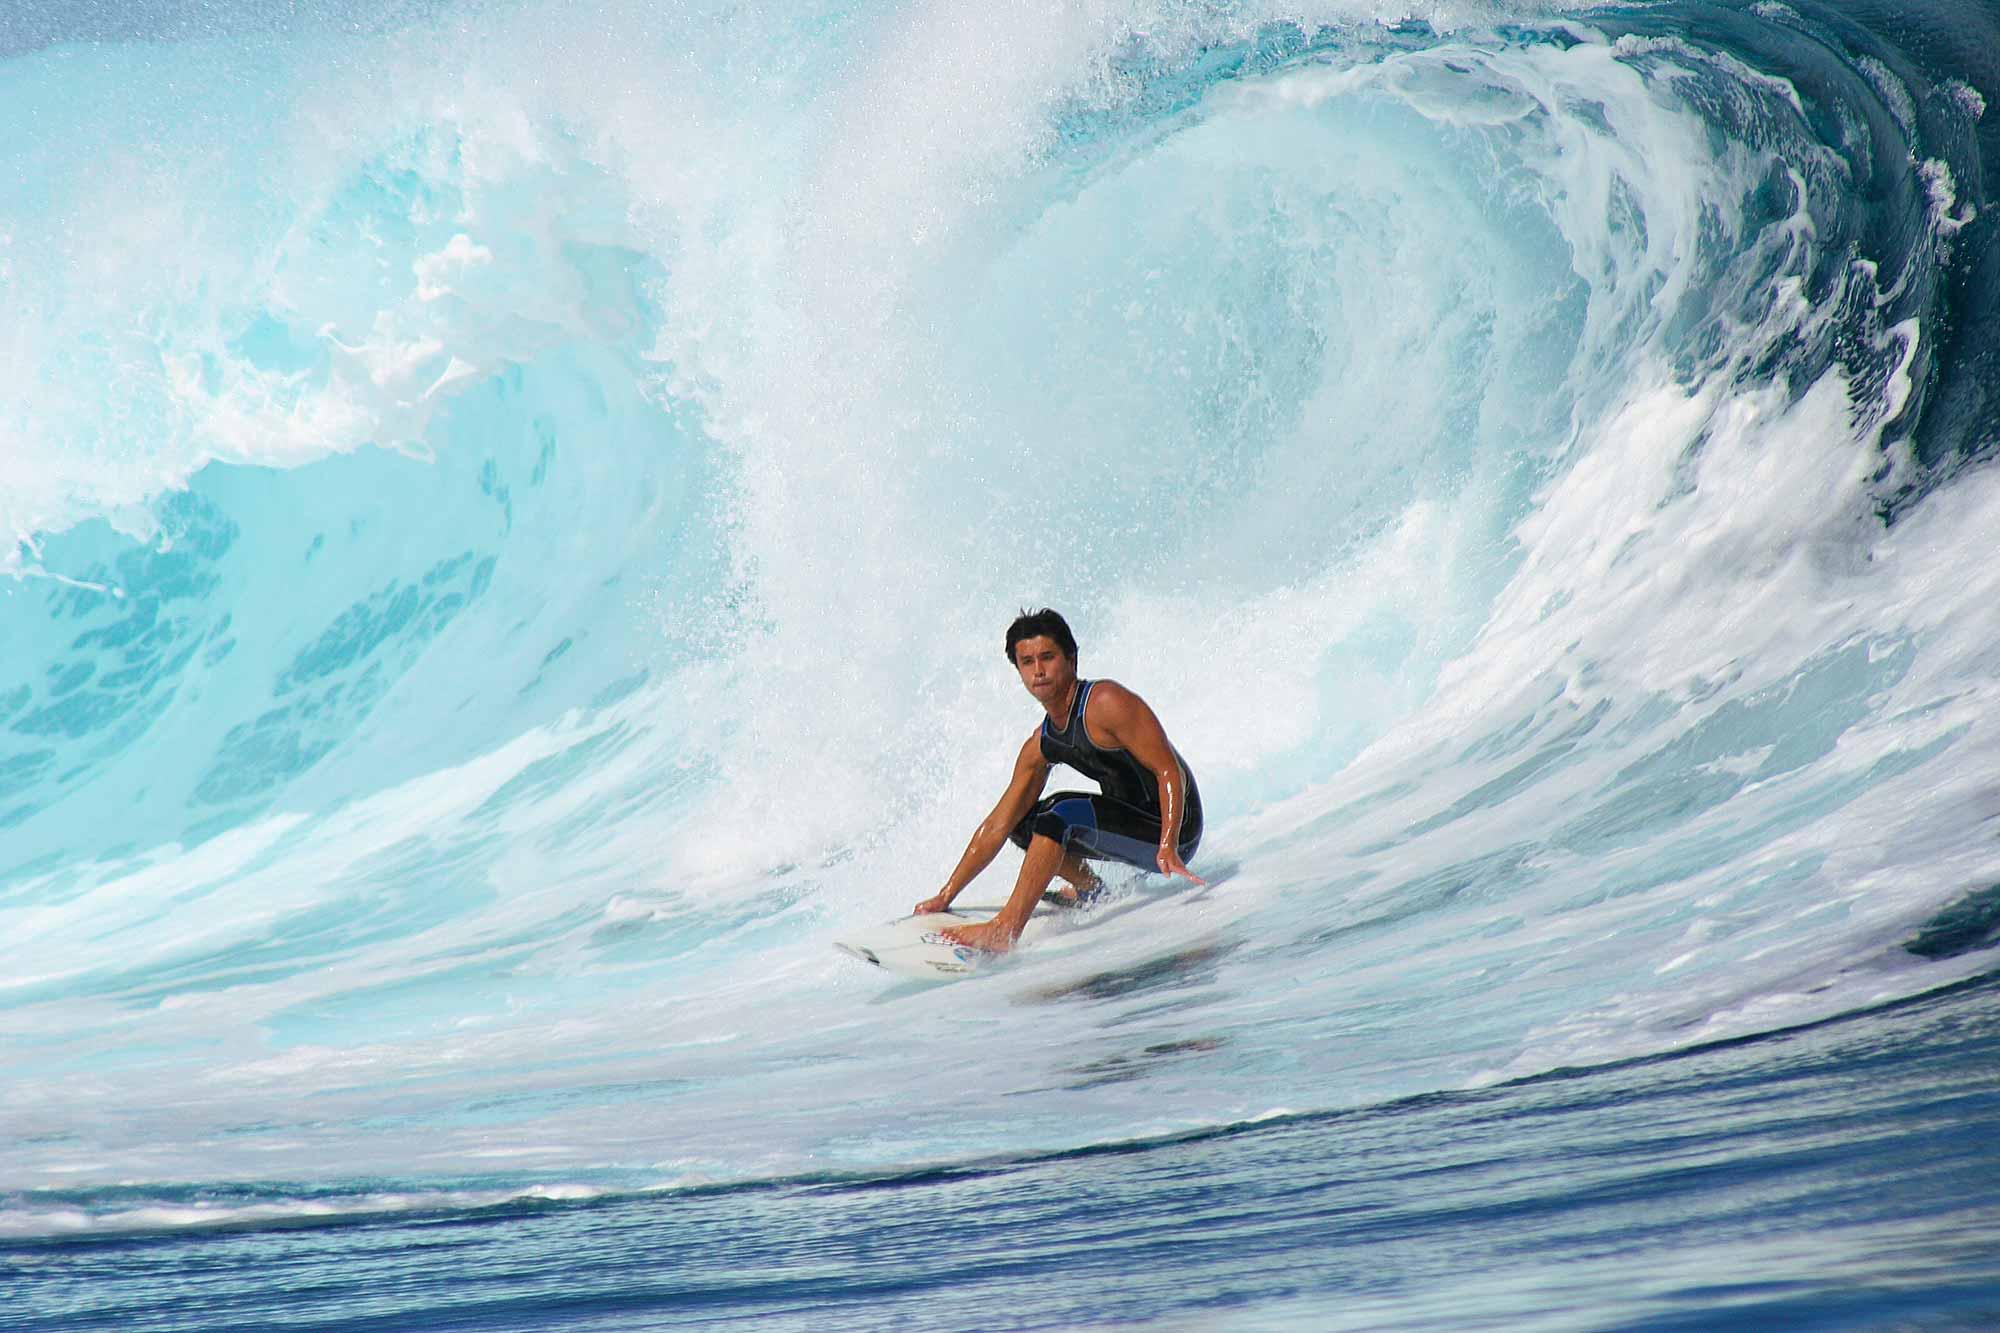 surfing-teahupoo-tahiti-frenchpolynesia-4